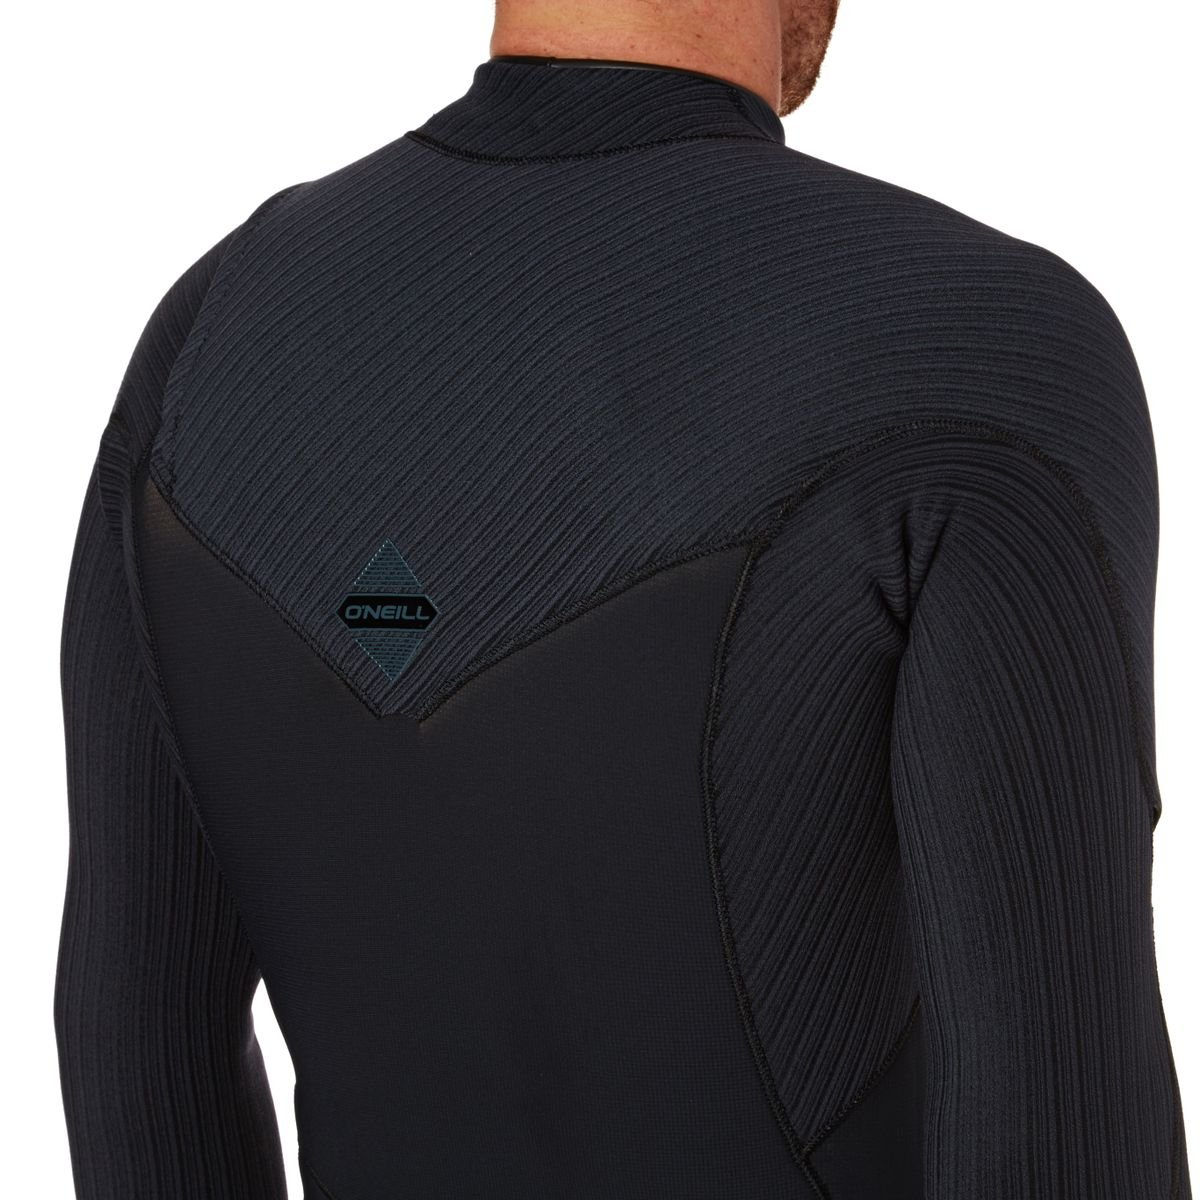 O;Neill Hyperfreak 5 Easy Stretch /& Lightweight 4MM Winter Kaltwasser Winterk/älte Brust Zip GBS Neoprenanzug Schwarz